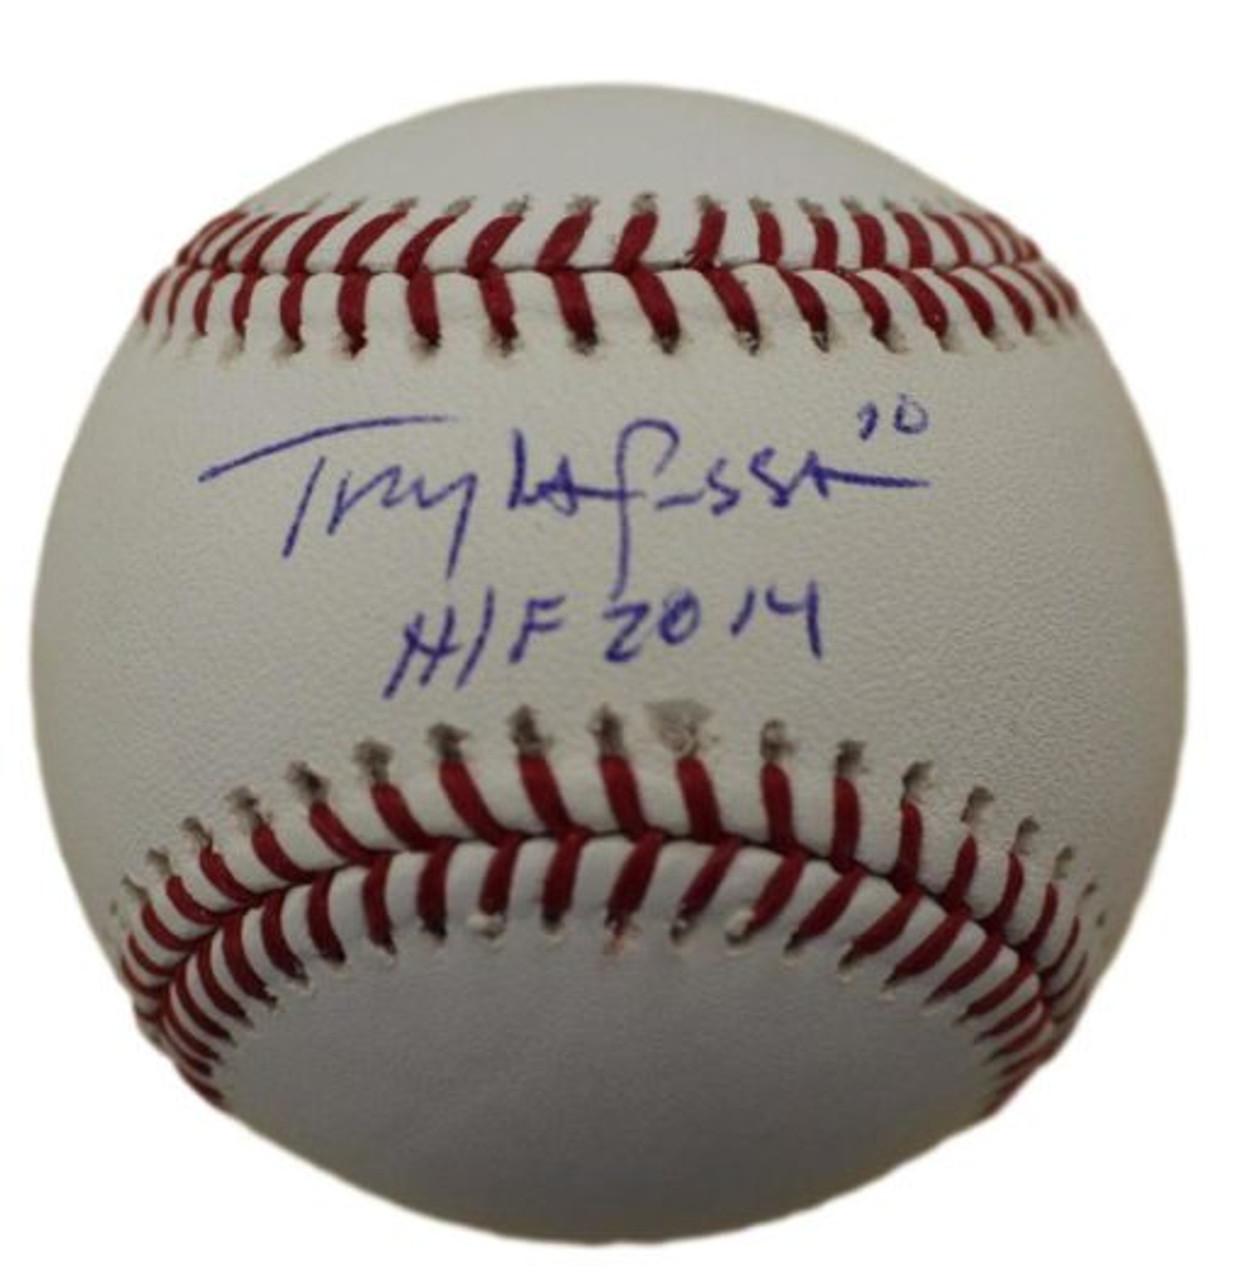 Tony Larussa Autographed St Louis Cardinals Oml Baseball Hof Jsa